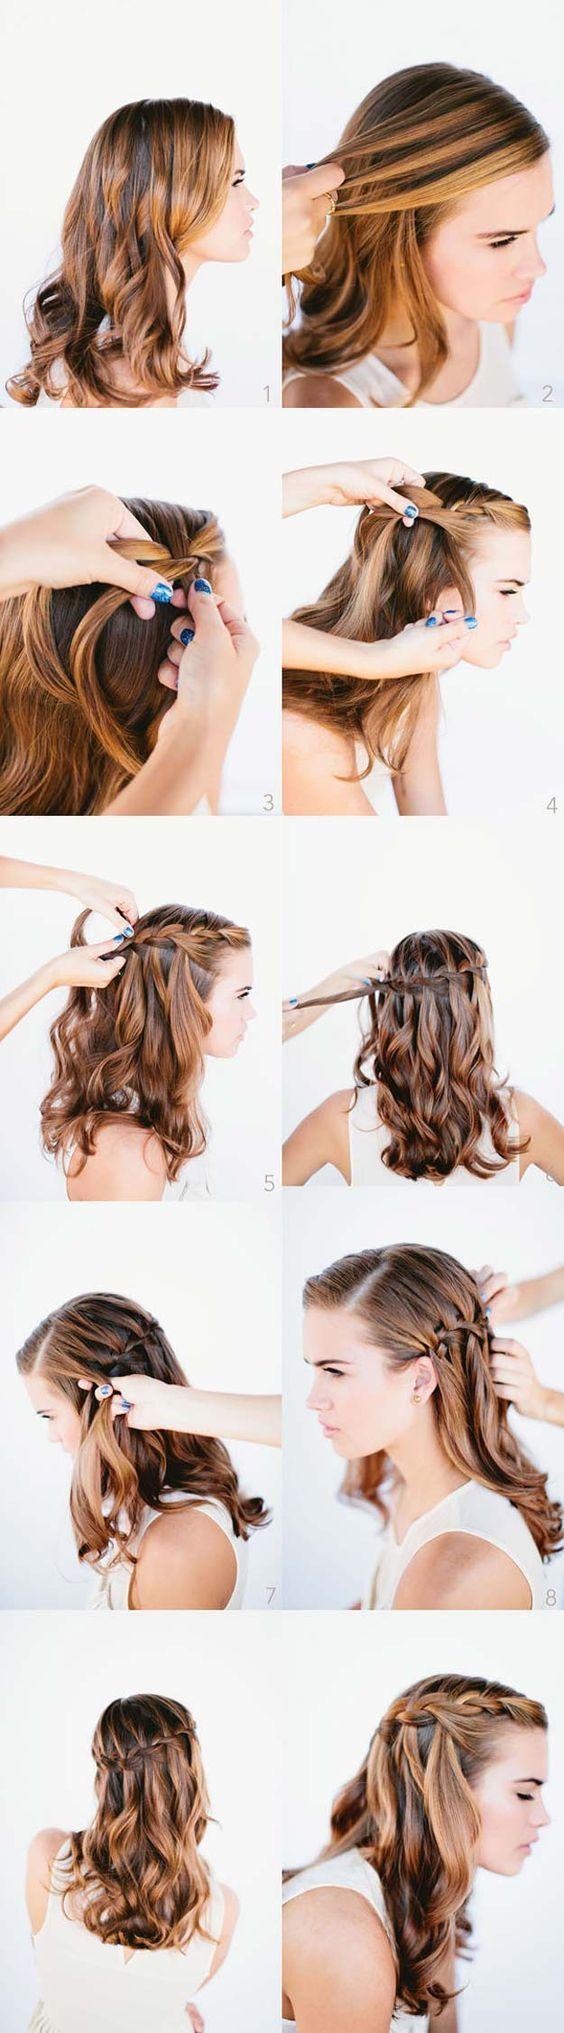 Best Hair Braiding Tutorials - Waterfall Braid Wedding Hairstyles ...